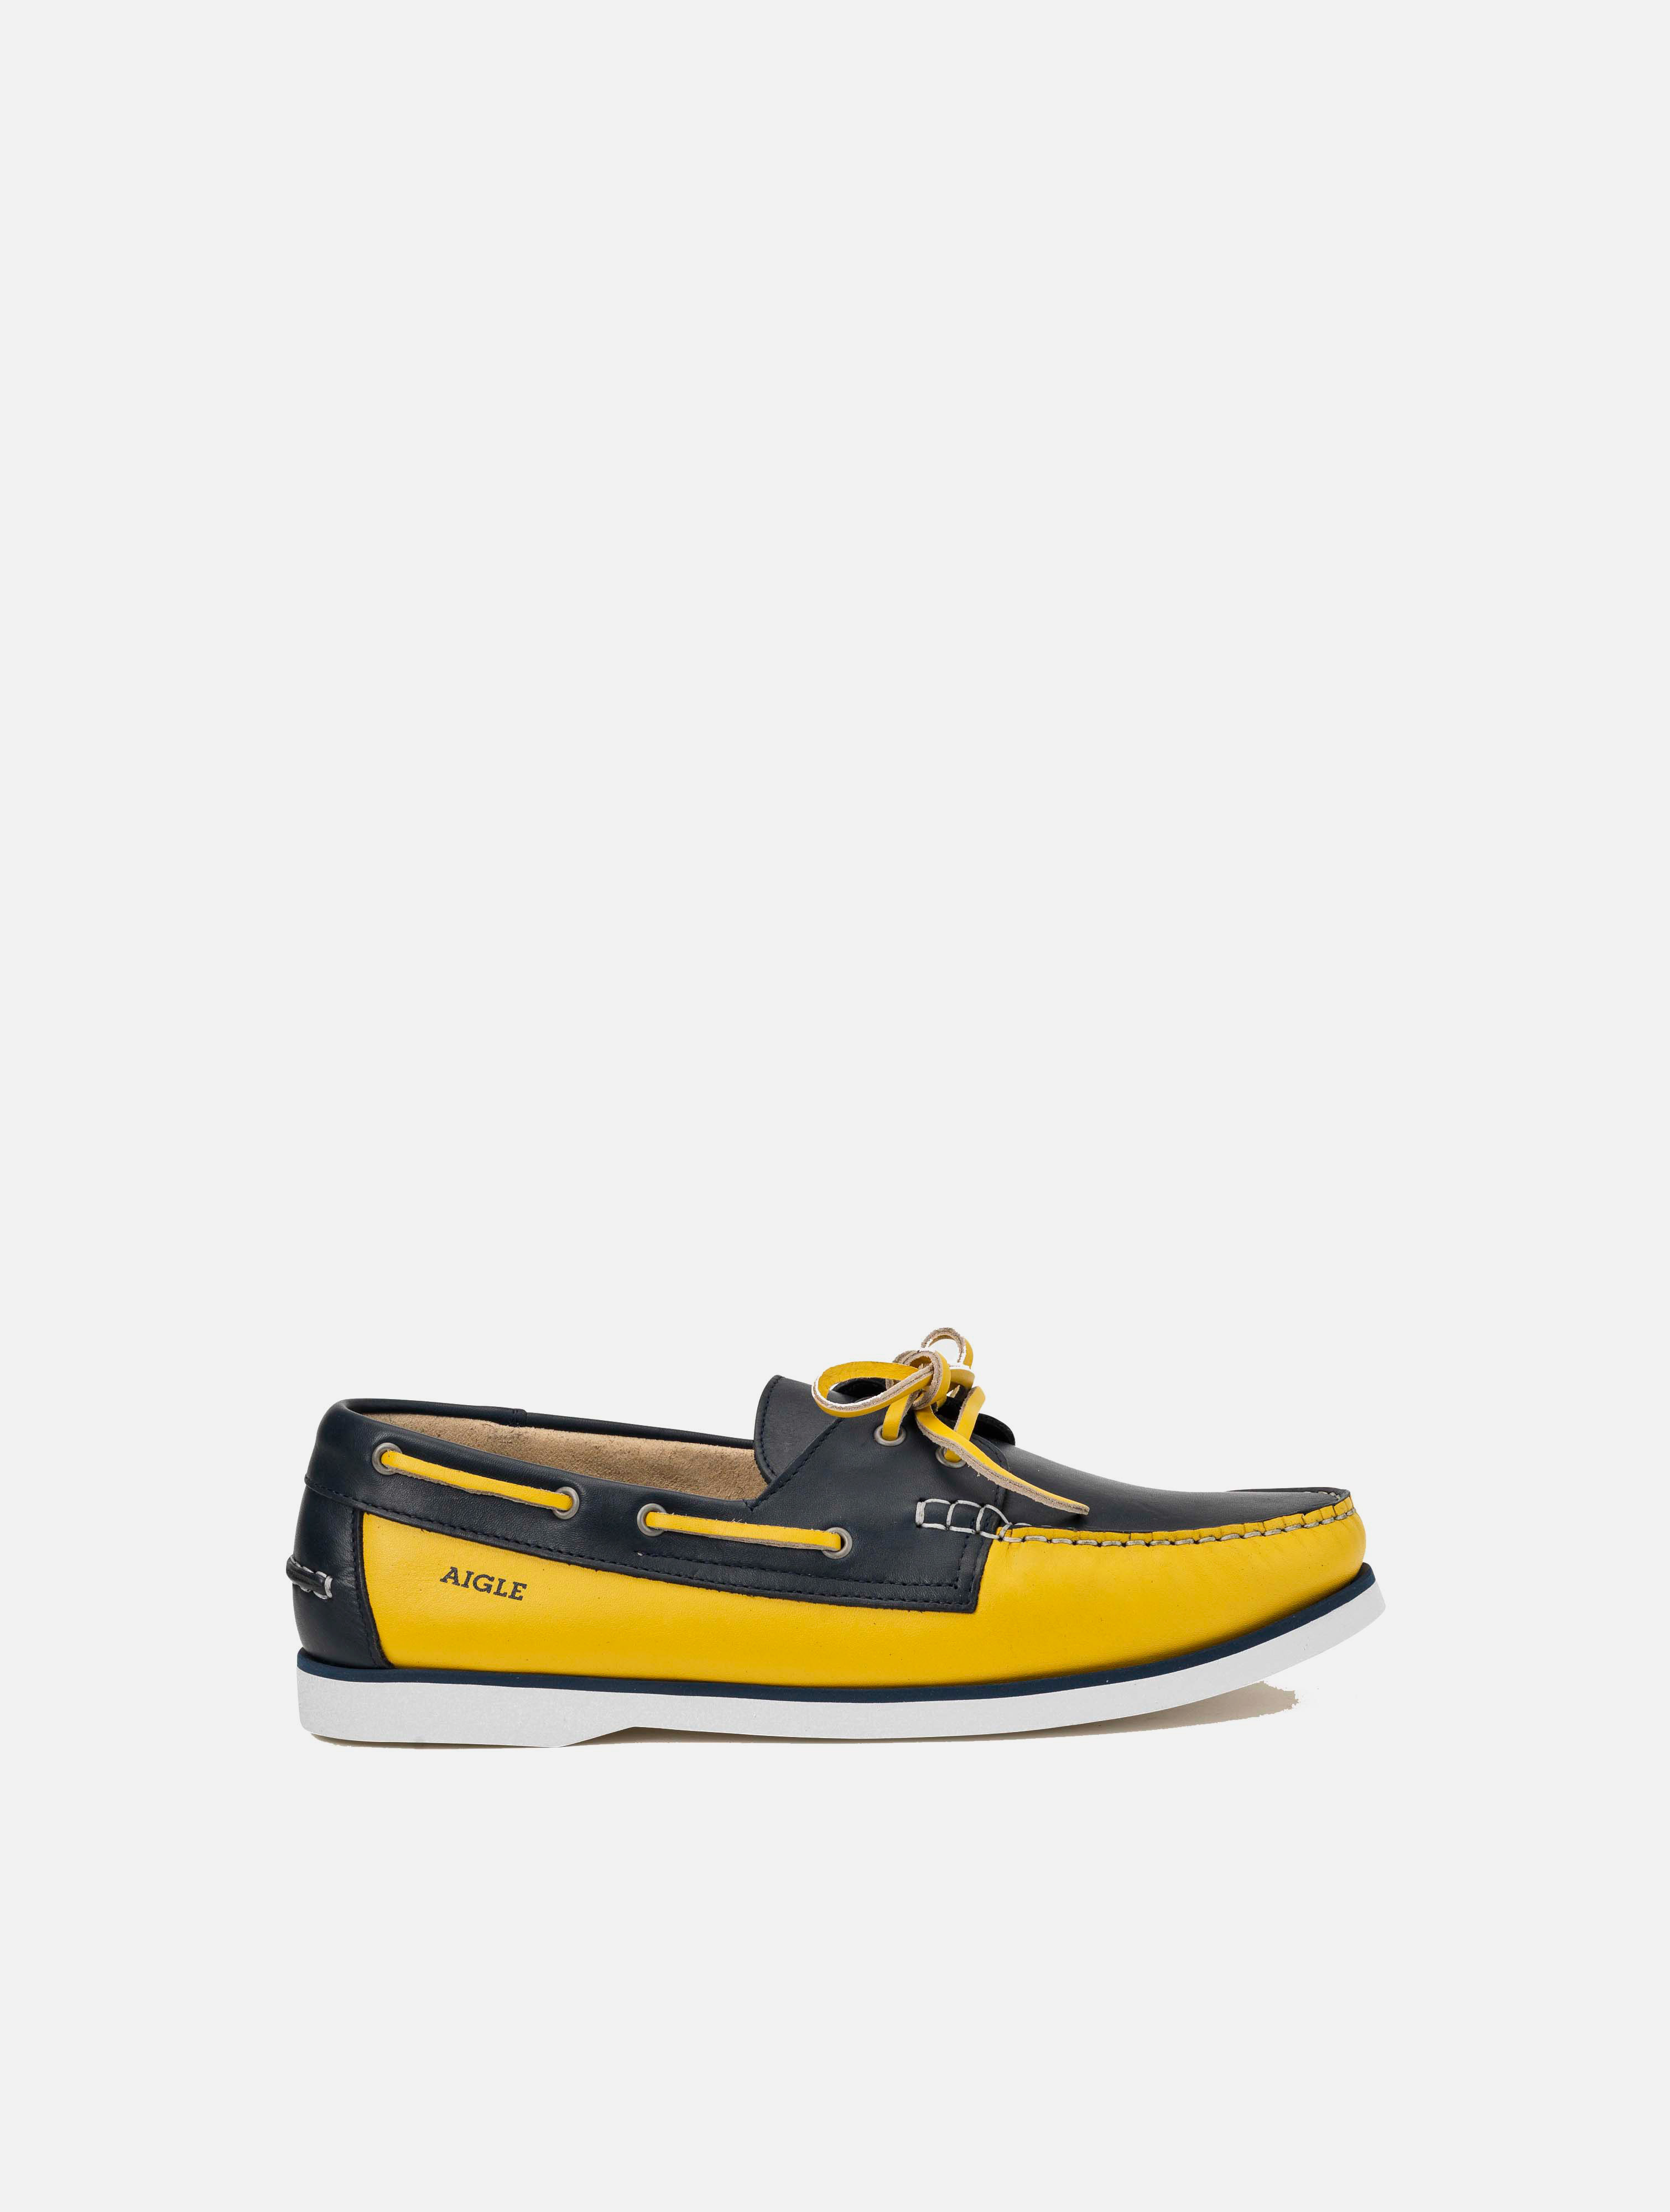 Chaussure bateau en cuir homme - Nubil